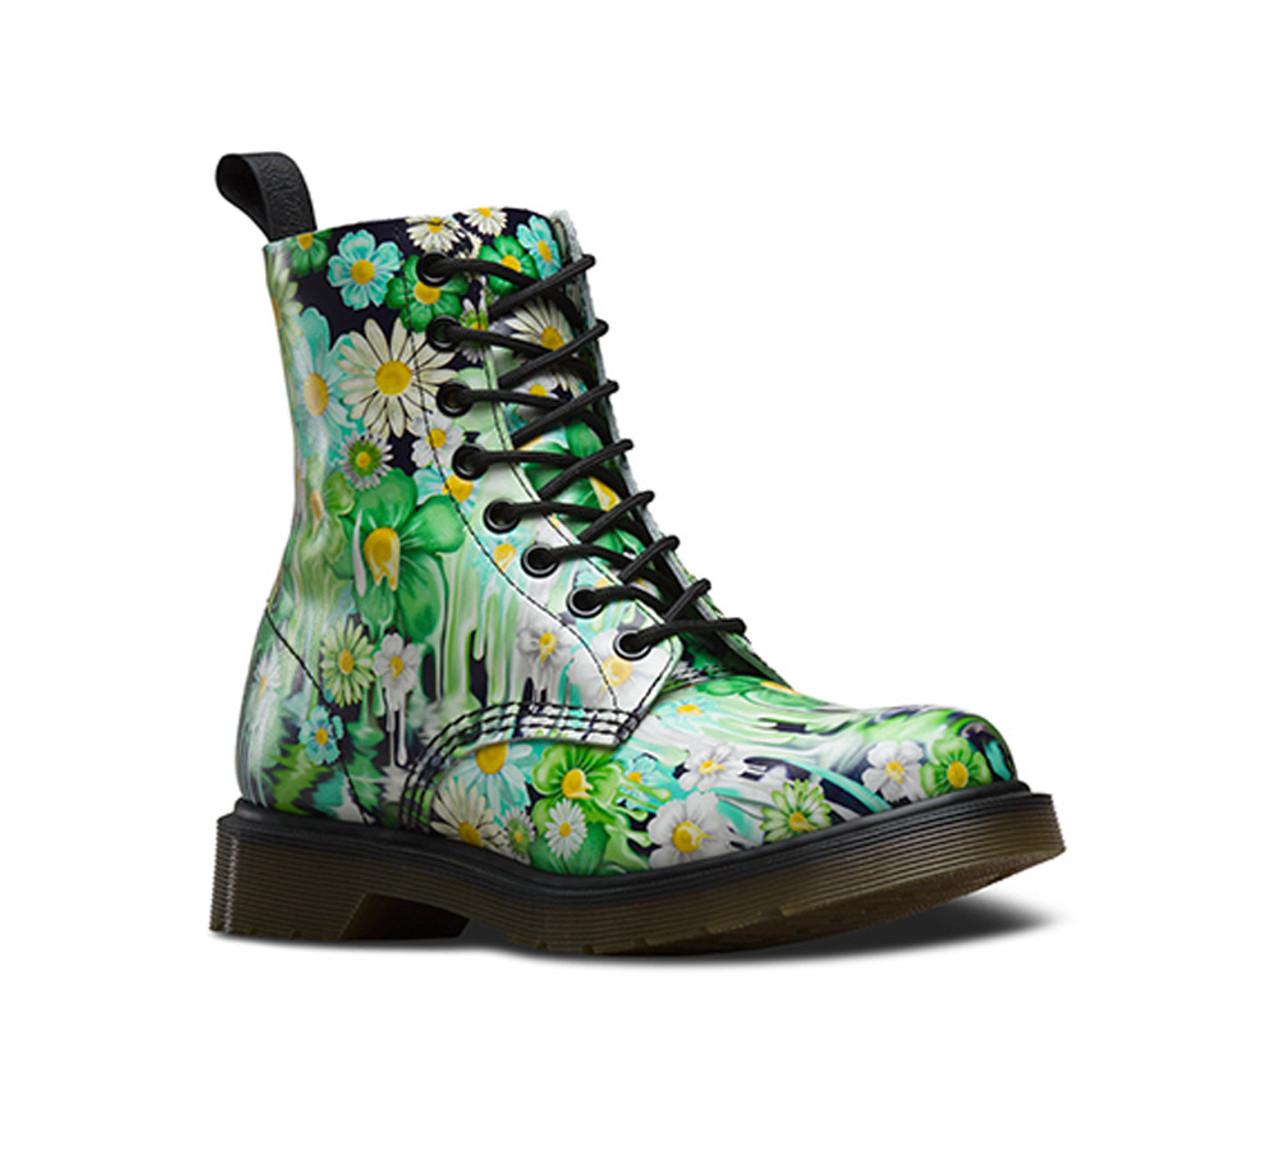 Dr Martens Women s Slime Floral Pascal Boot Green Paint Slick Backhand -  Shop now   Shoolu f692d1e98b